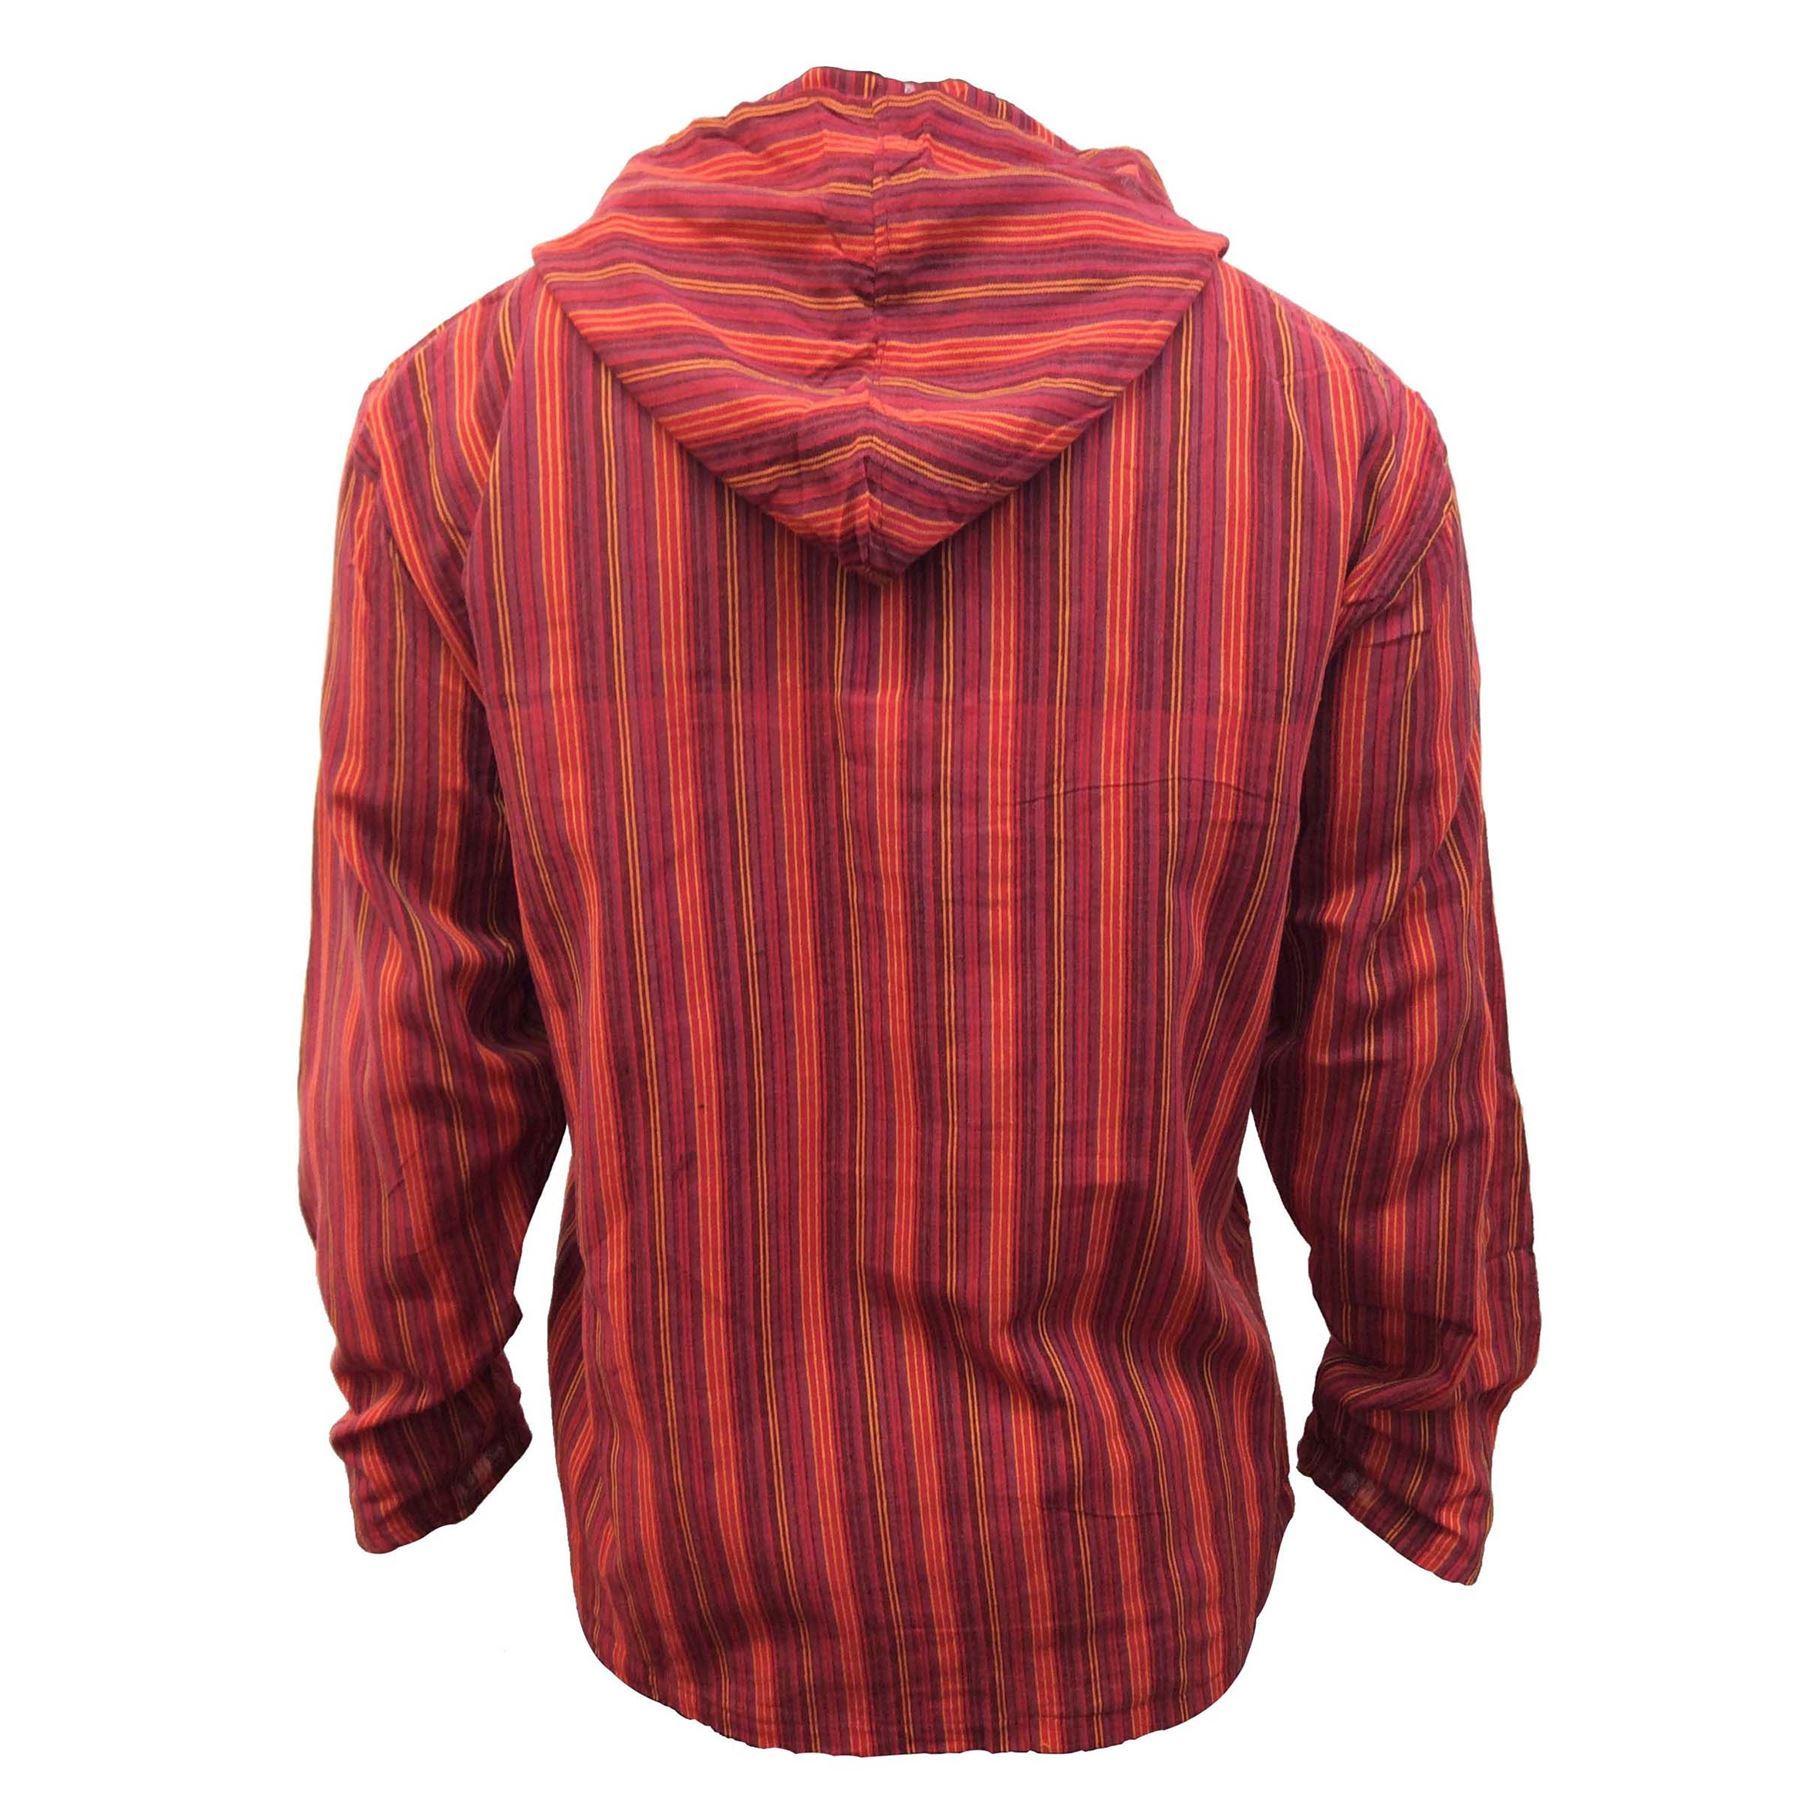 Men-039-s-Cotton-Grandad-Shirt-Full-Sleeved-Hippie-Top-Festival-Stripe-Hippy-Hoodie thumbnail 19